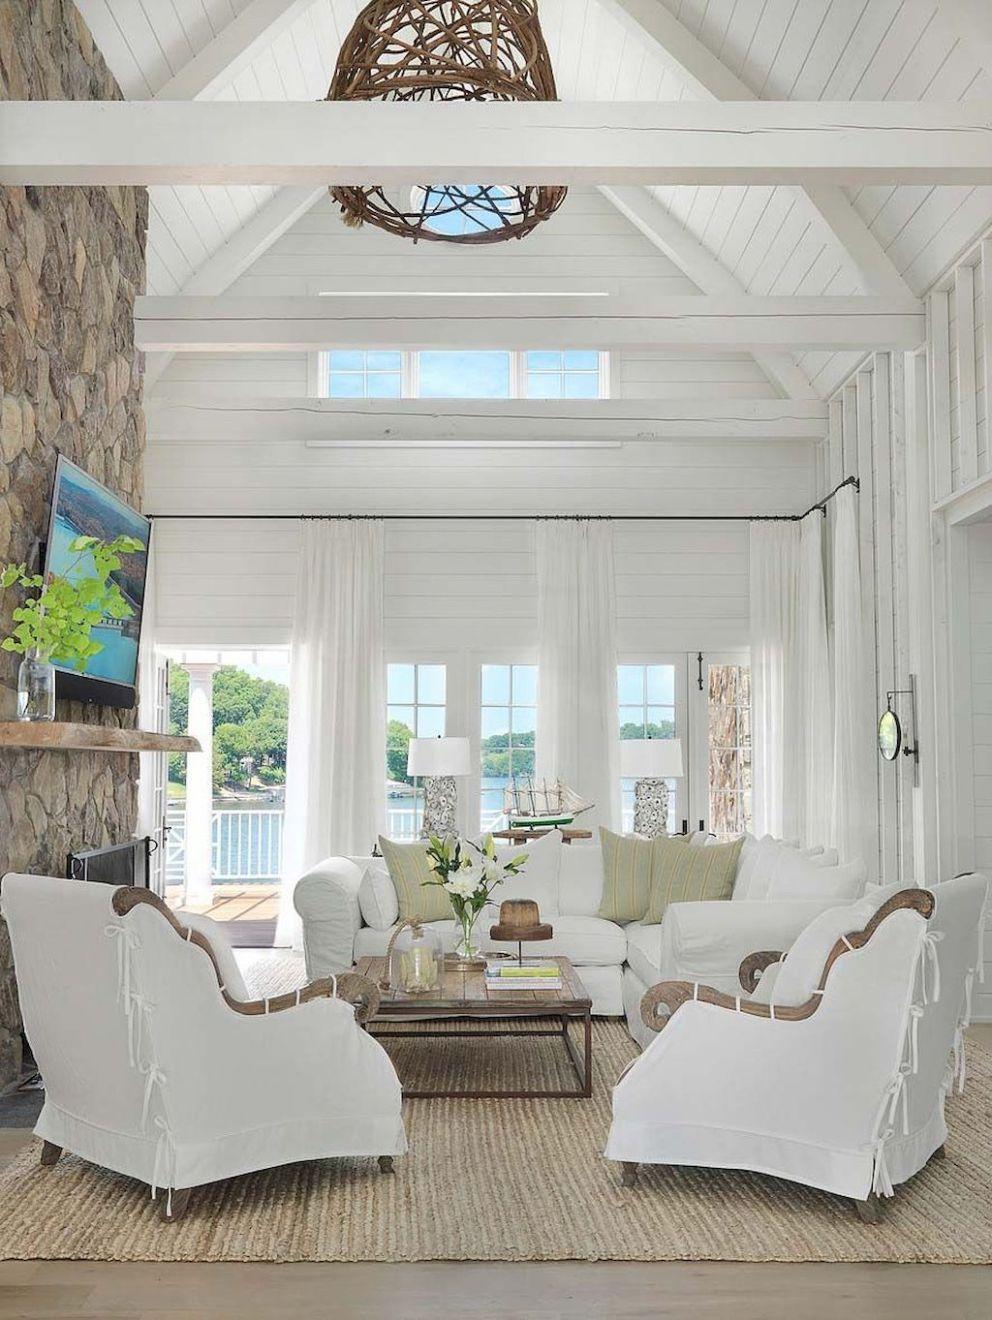 50 beautiful lake house living room ideas 5bacbda95dd96 in 2019 rh pinterest com